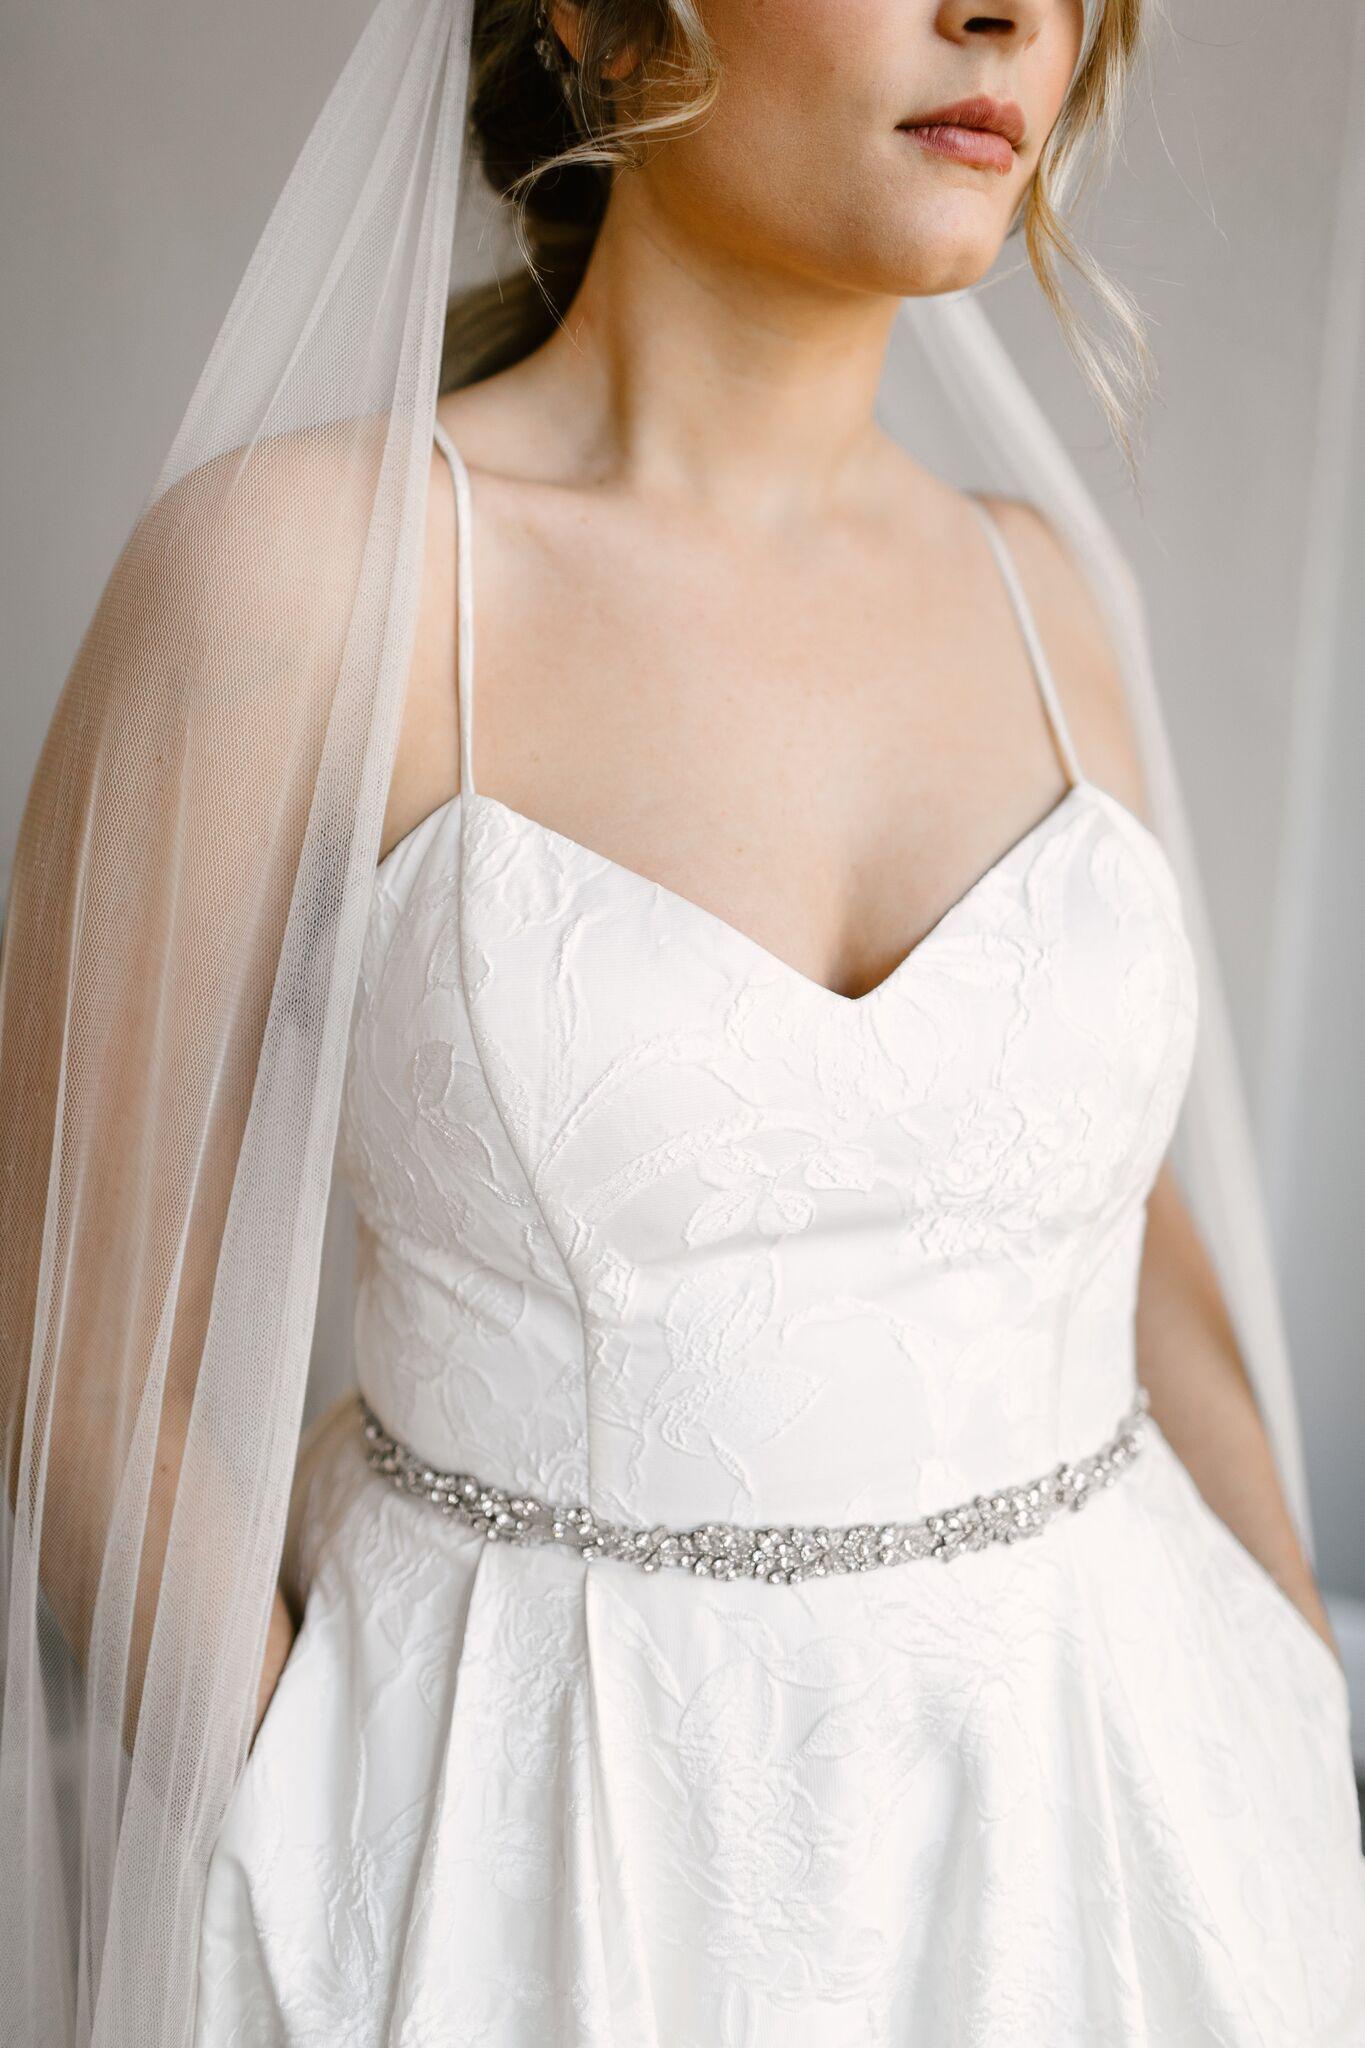 Bess Sash Untamed Petals Wedding Accessories Wedding Dress